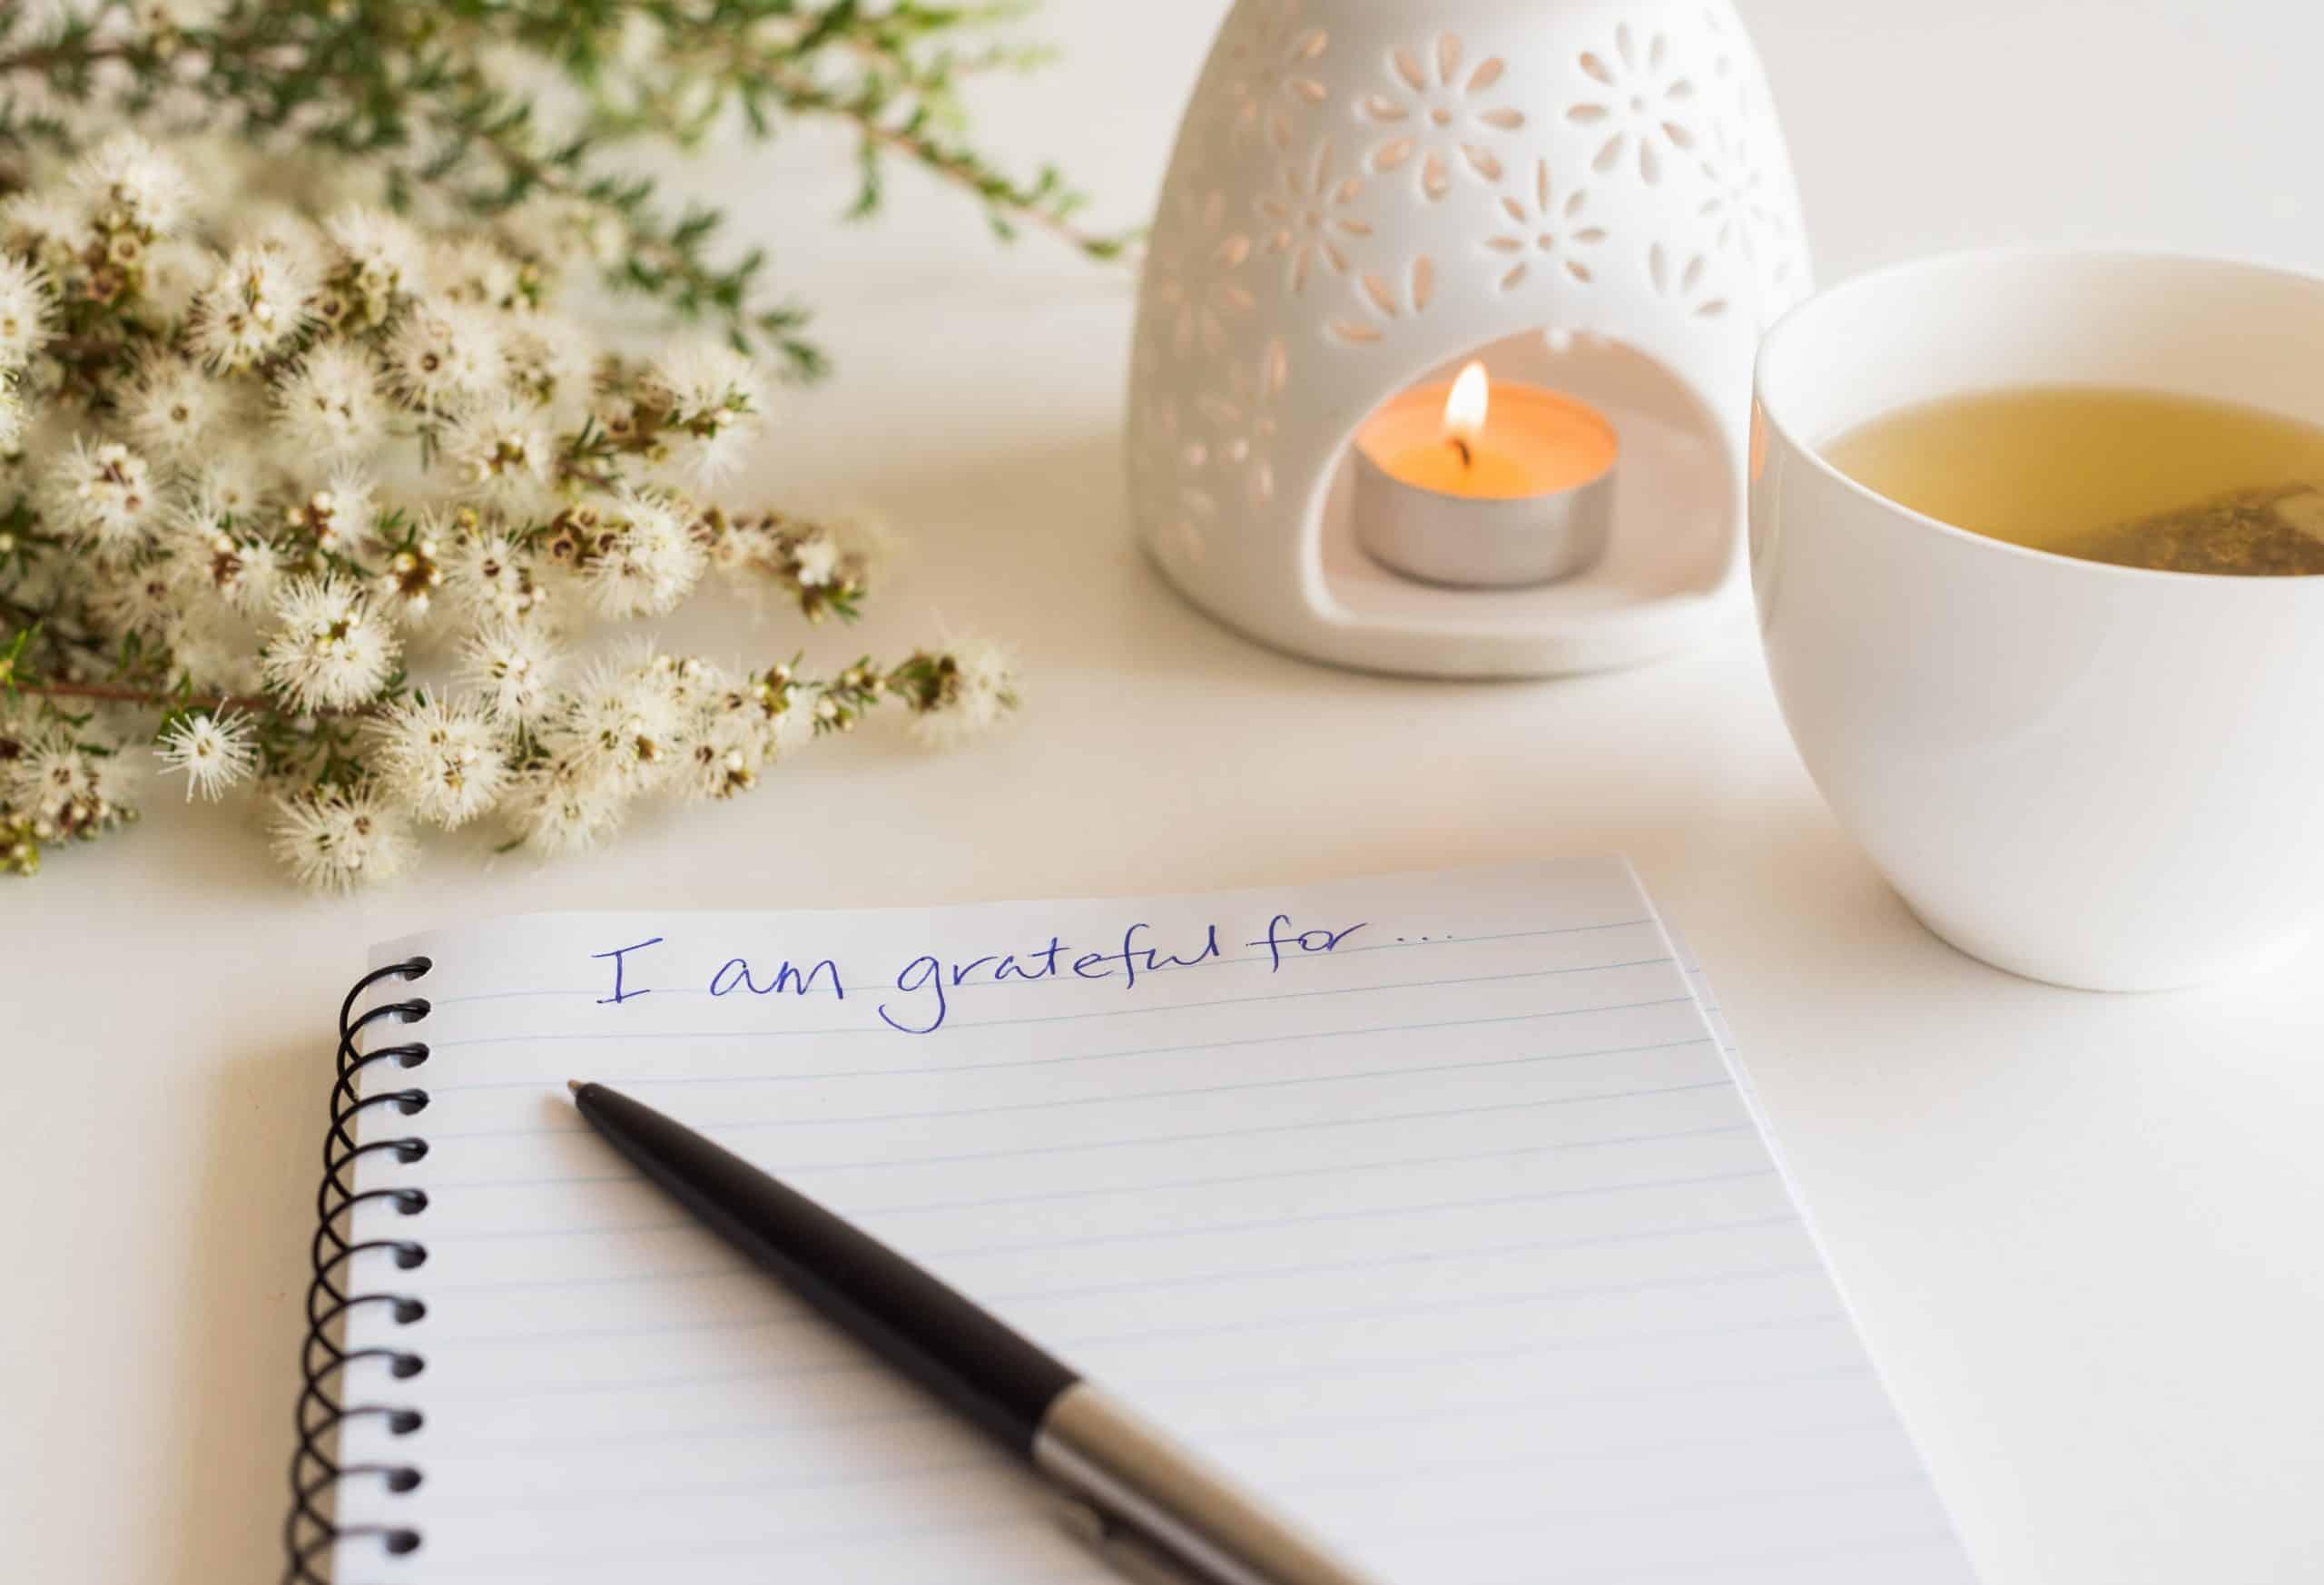 gratitude scaled